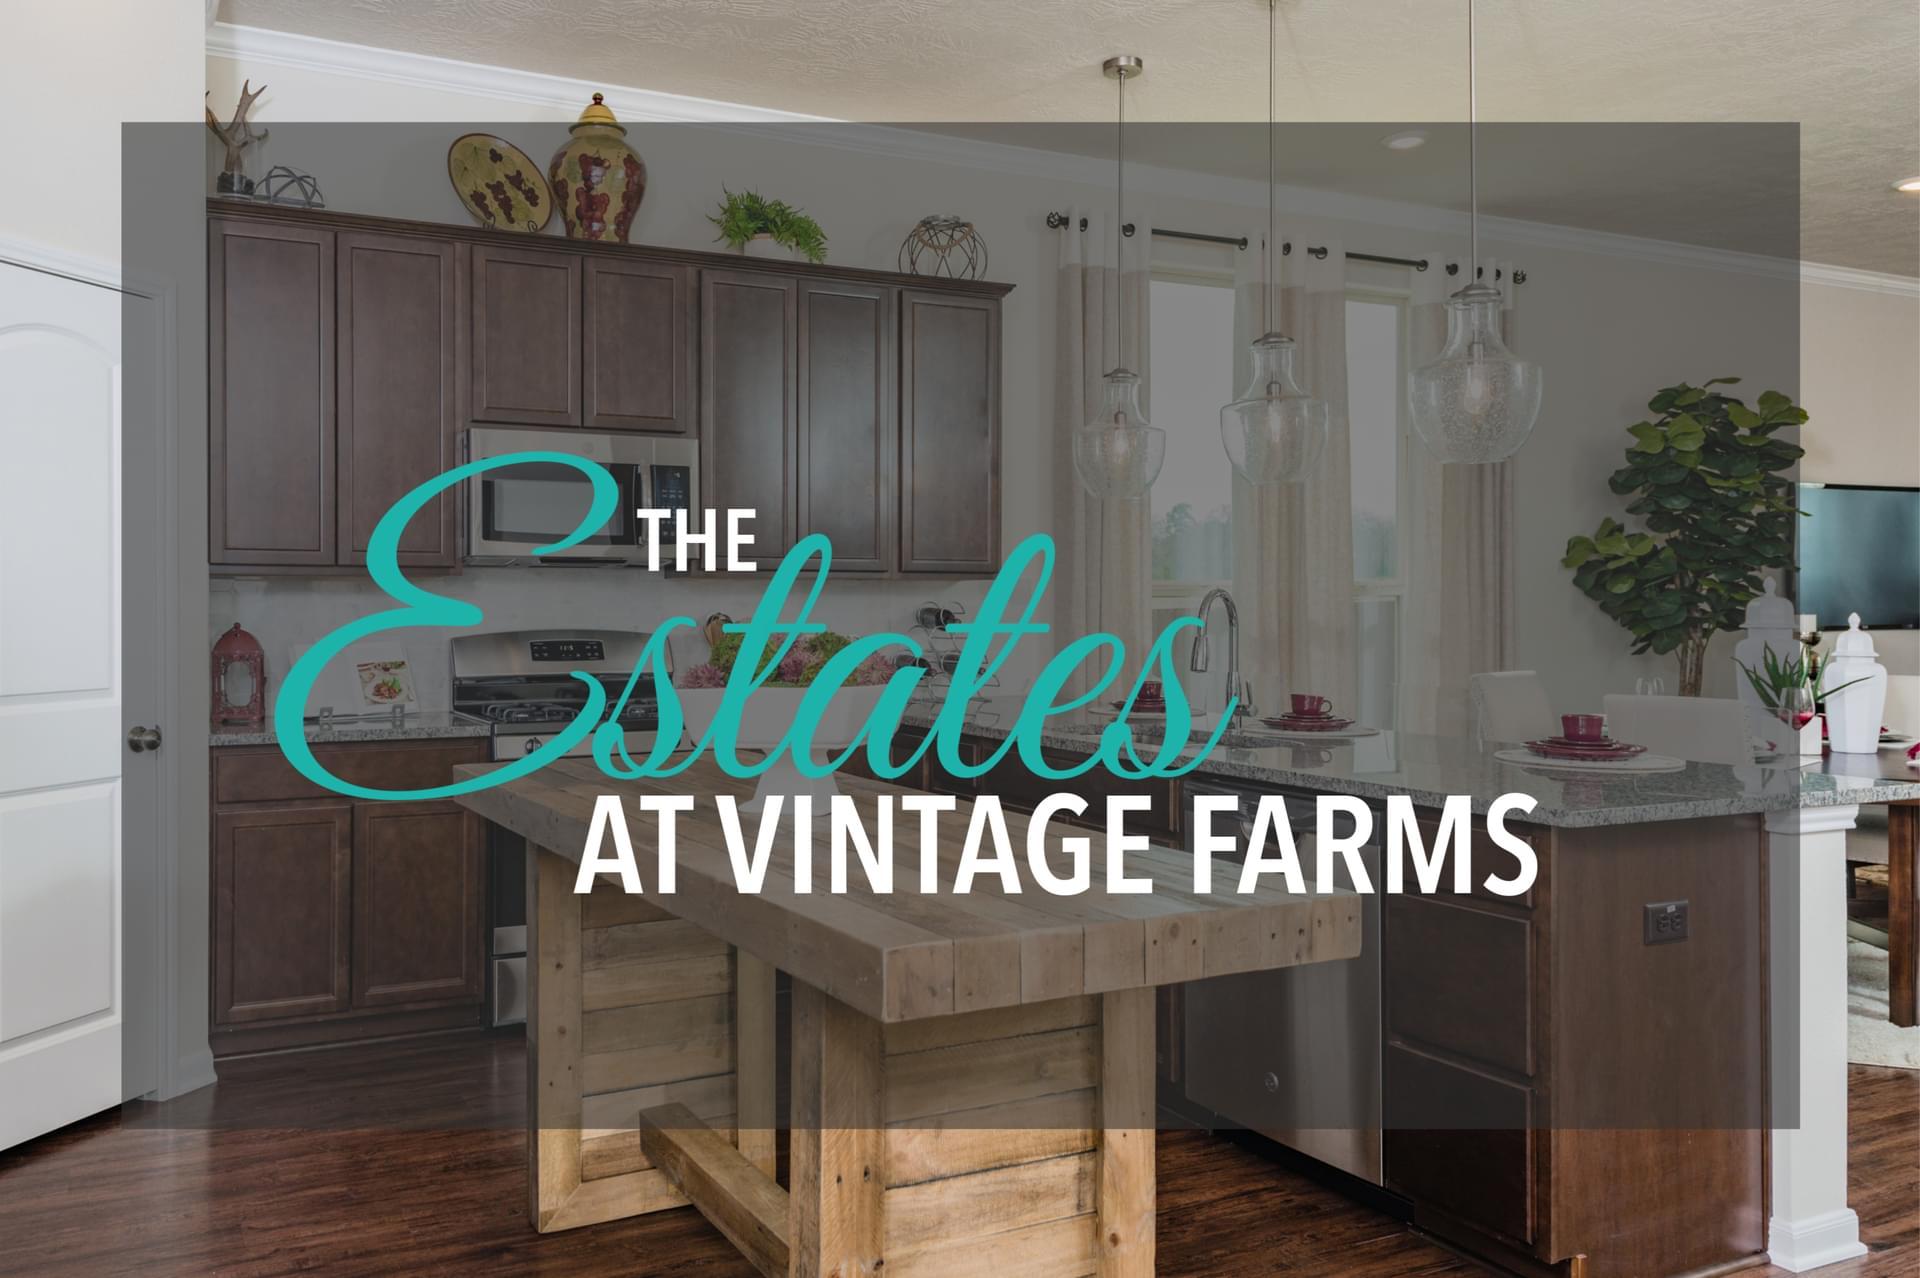 The Estates at Vintage Farms in Brenham, TX